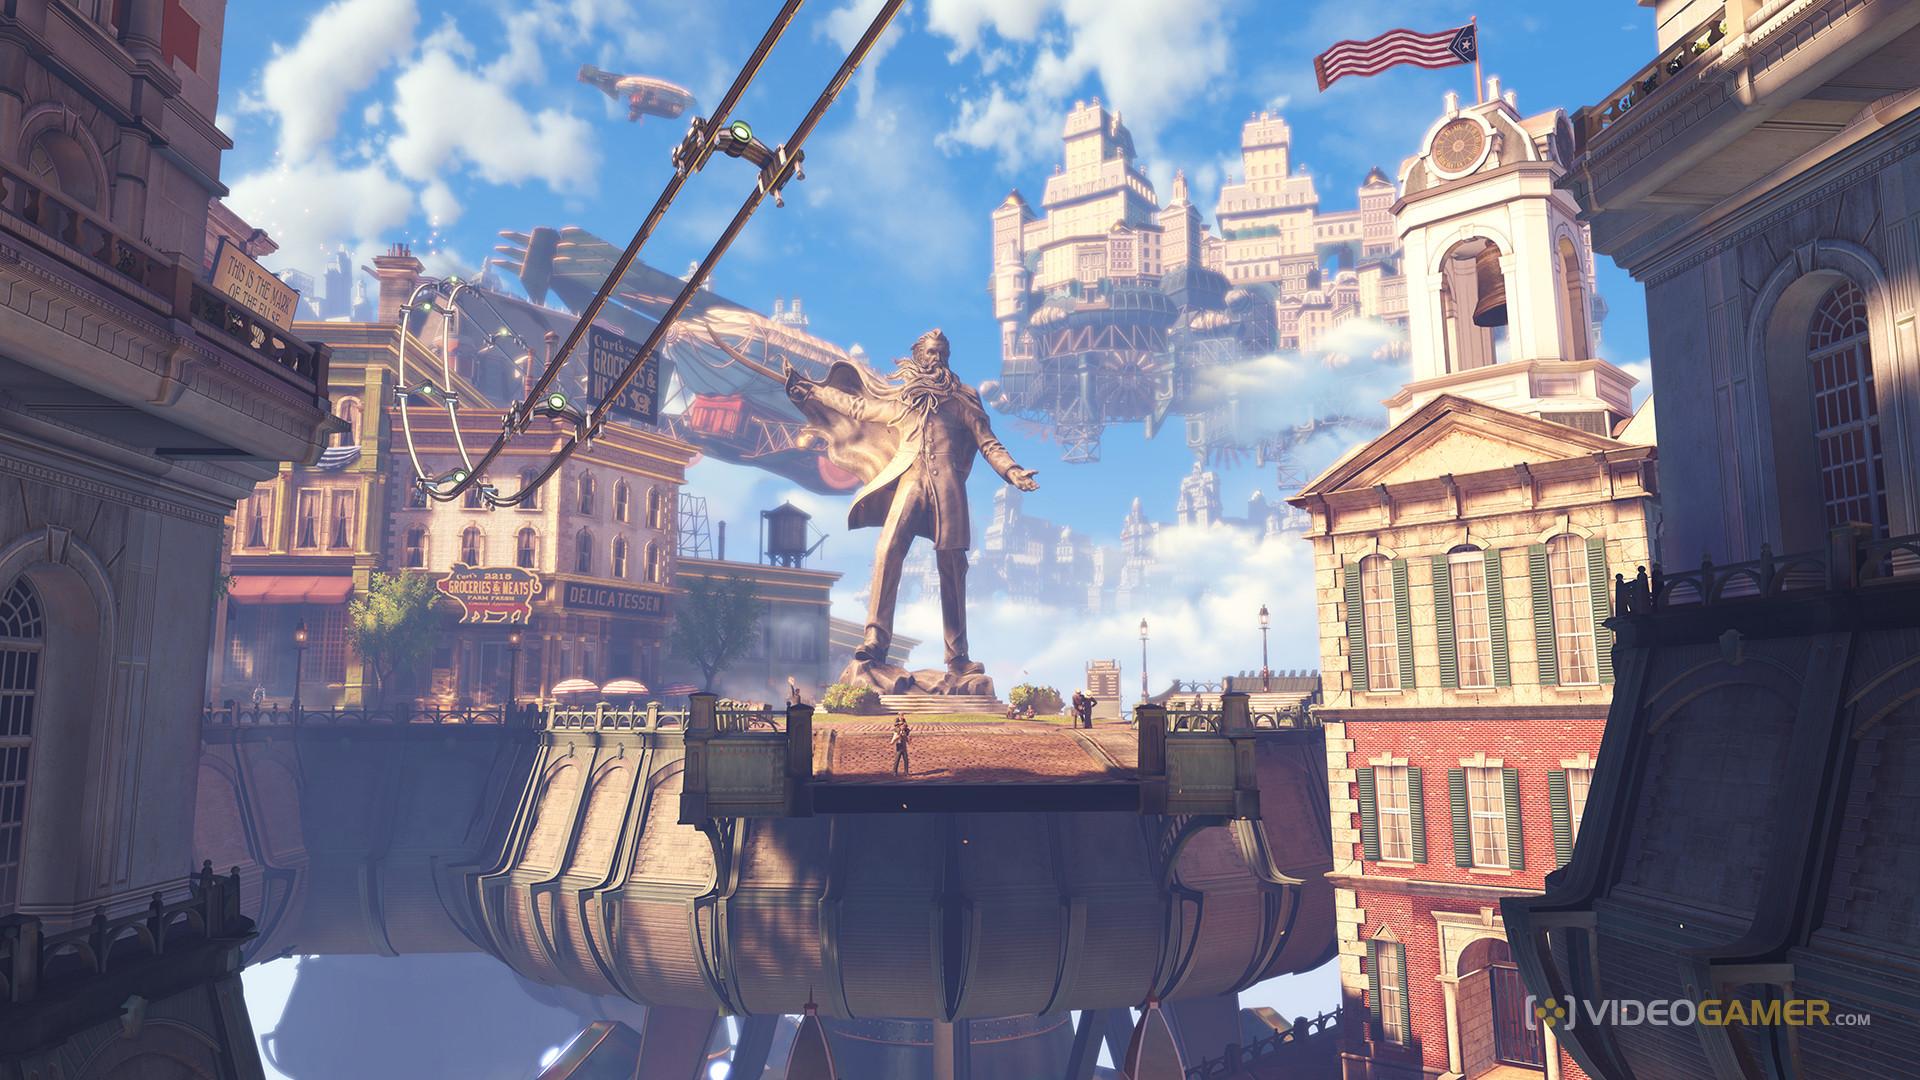 PrevNextFull size imageBack to screenshots · NextPrev BioShock Infinite Screenshot